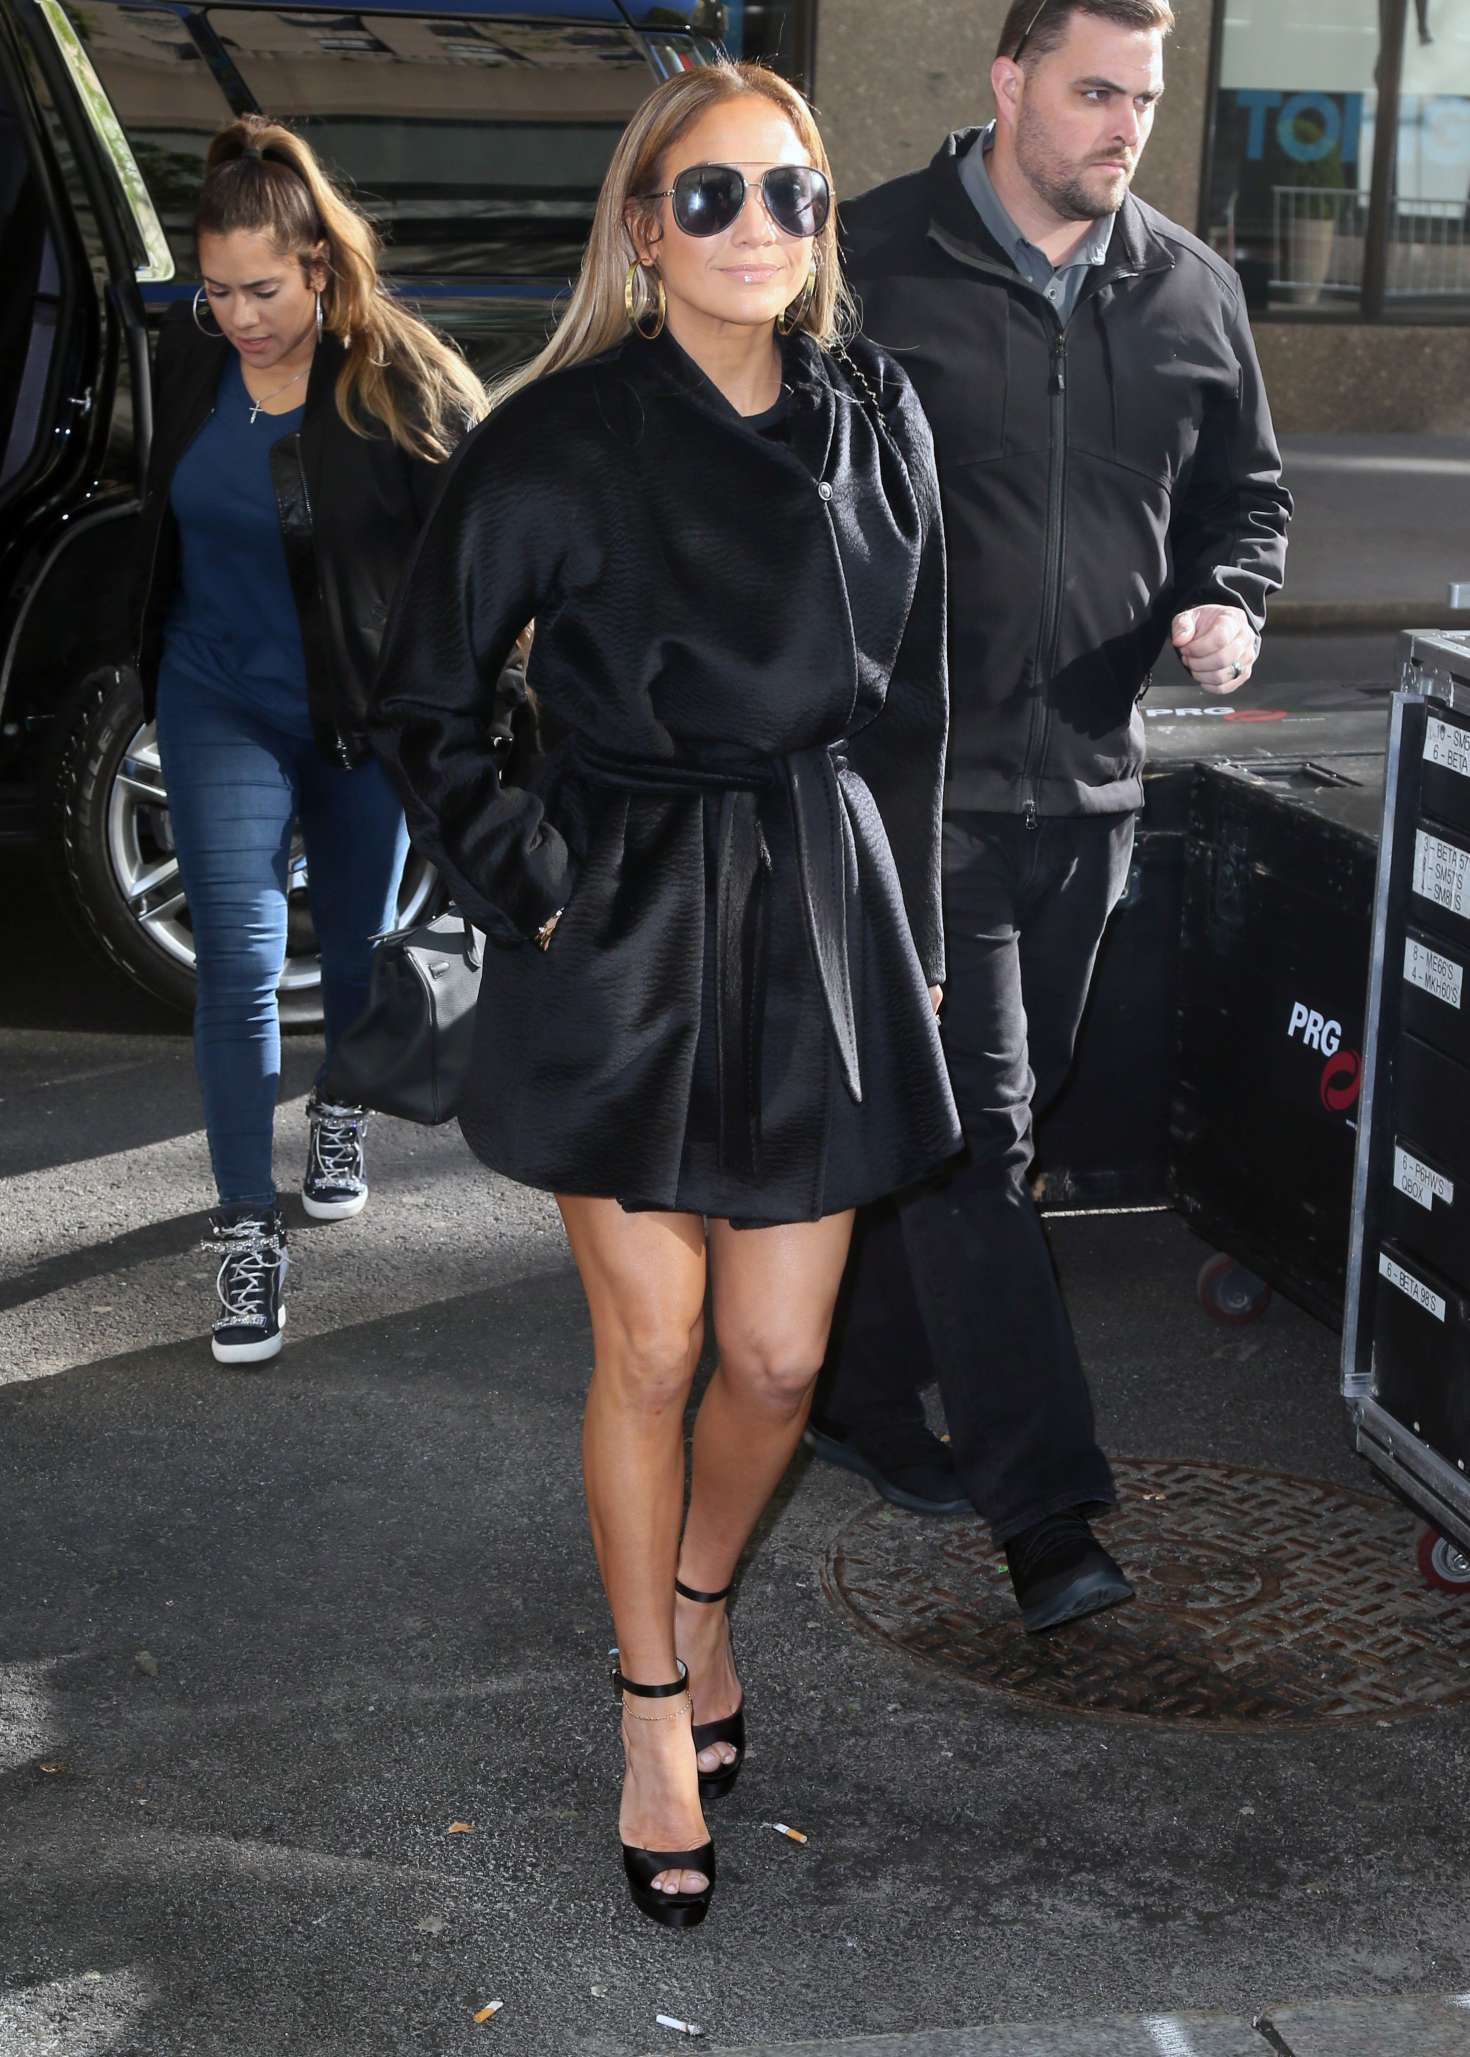 Jennifer lopez arrives to nbcs today show in new york city nudes (72 photo), Bikini Celebrity fotos